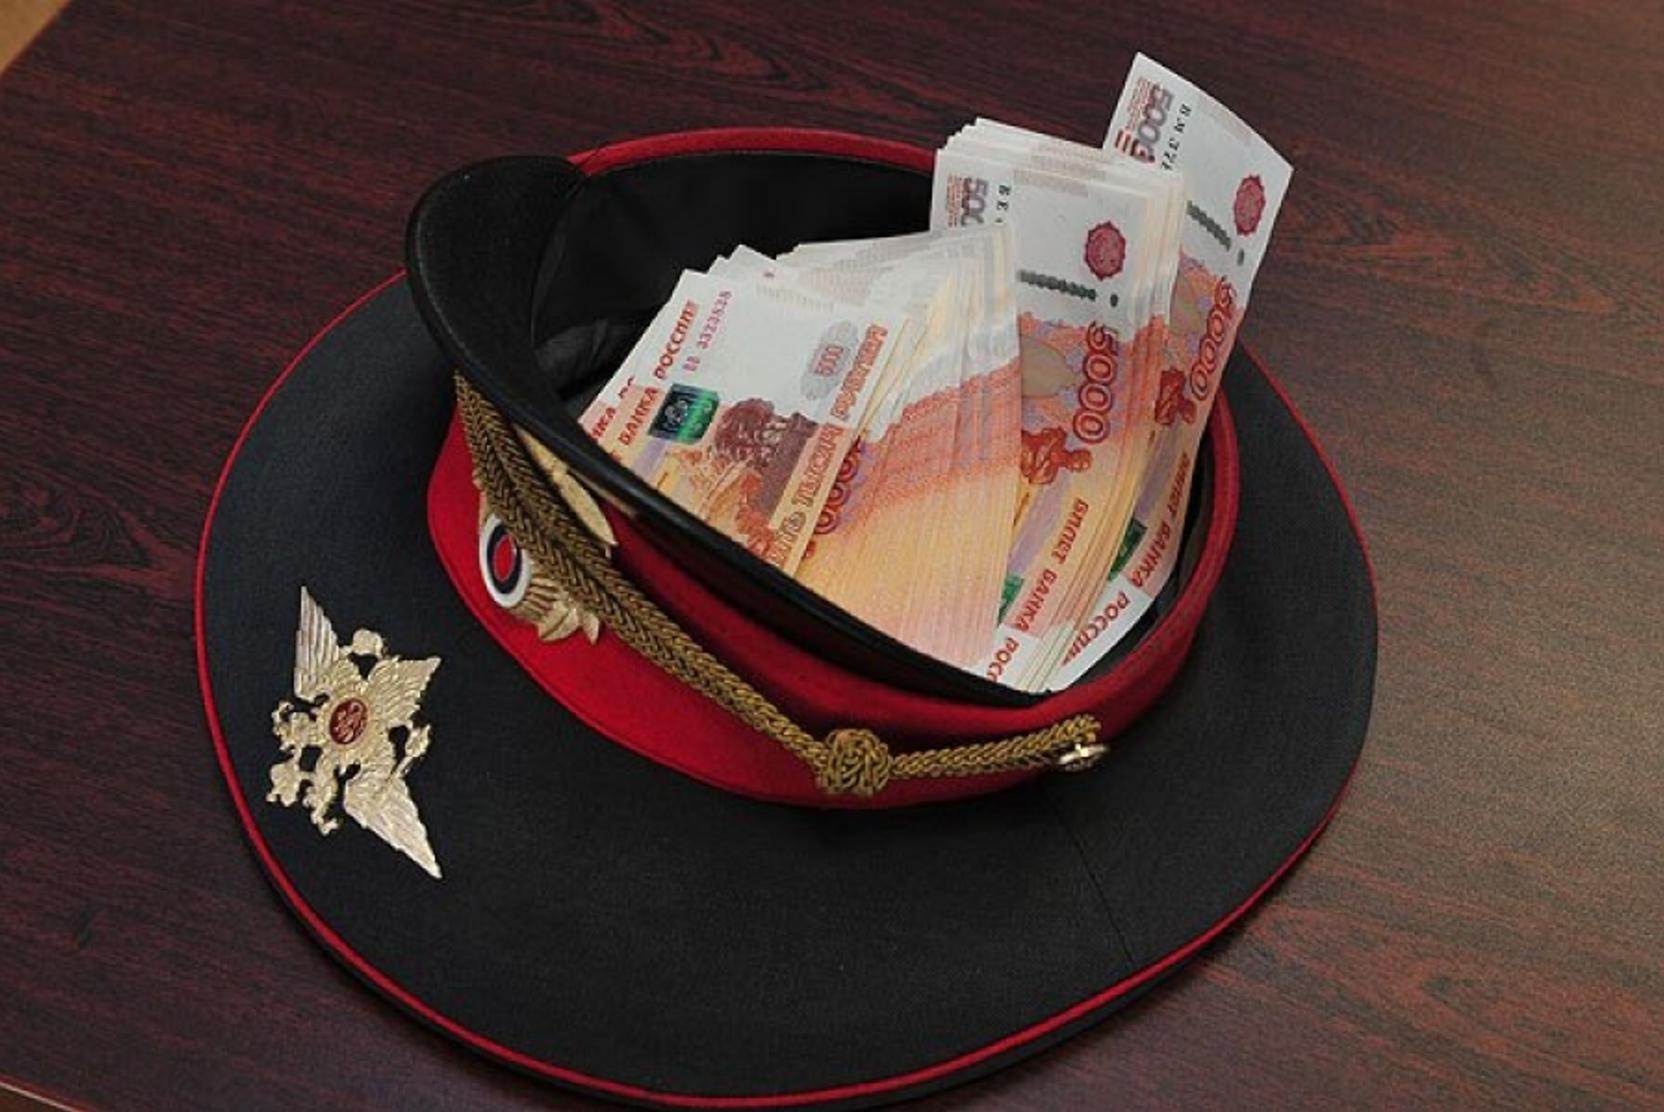 За взятку от пьяного водителя сотрудников ДПС взяли под стражу в Тверской области